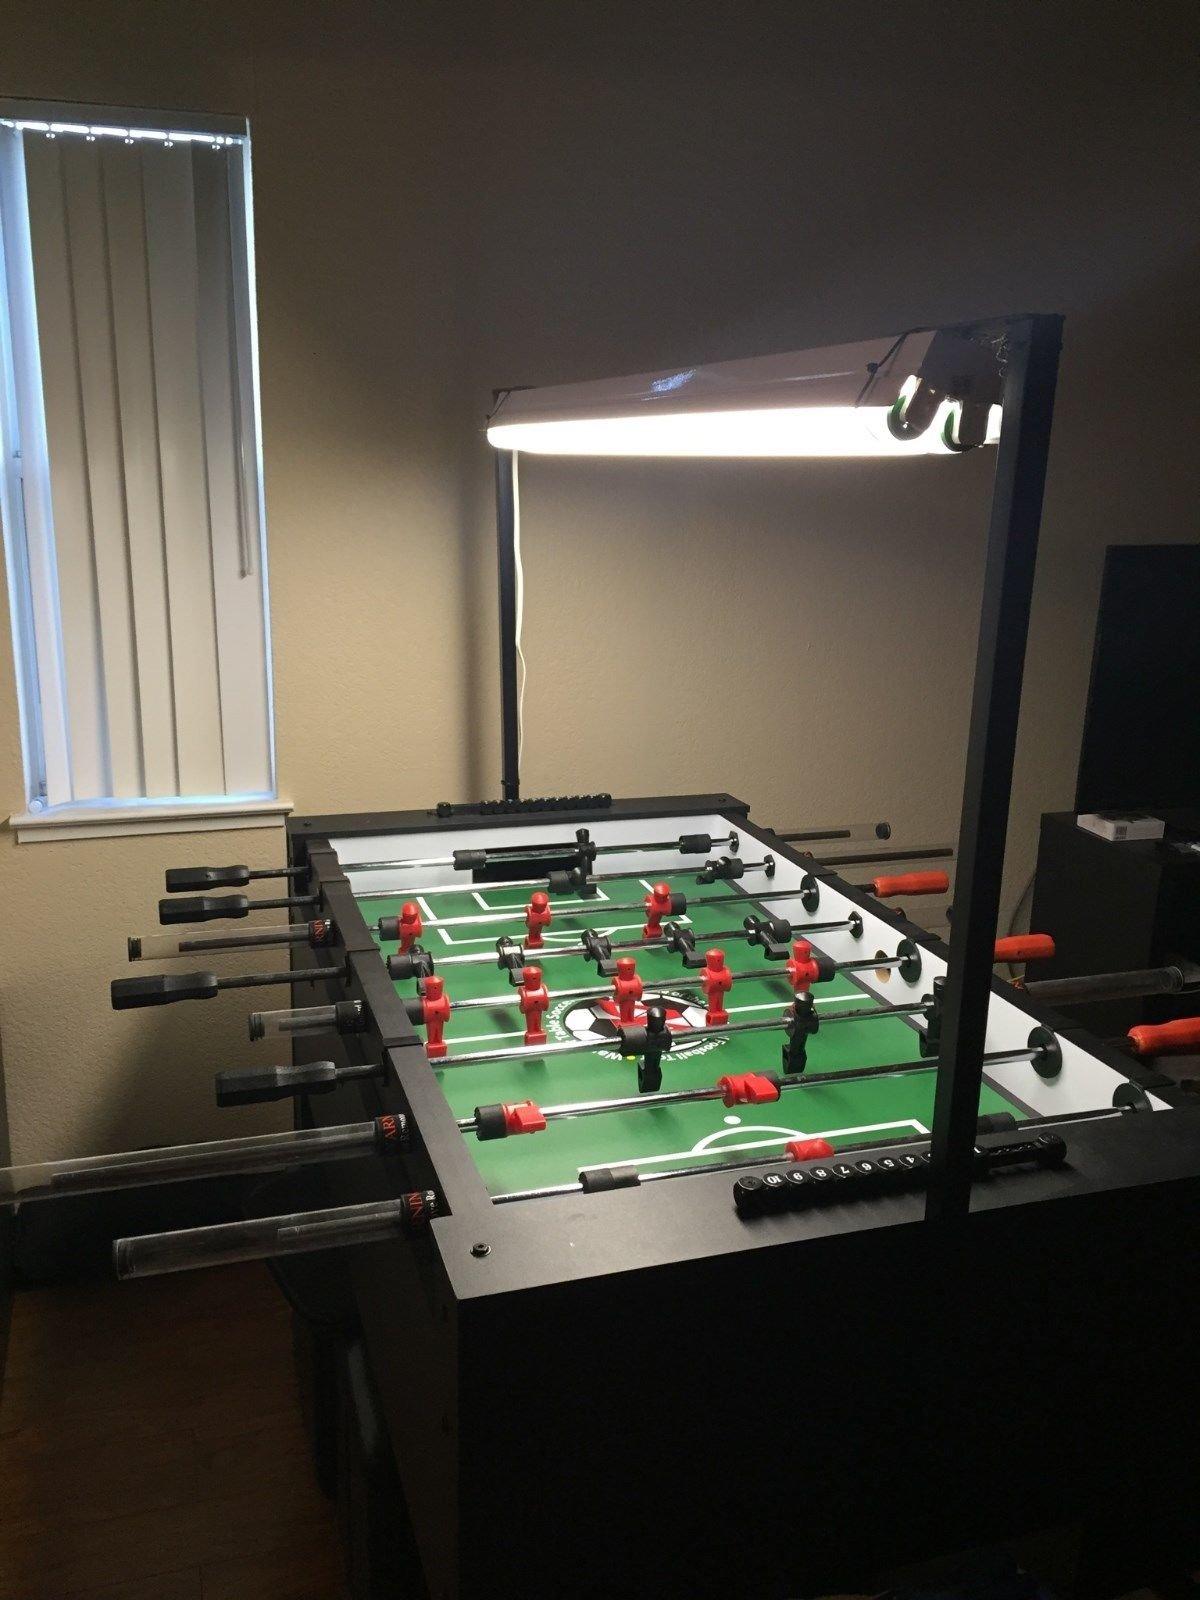 Warrior Table Soccer Foosball Light Fixture Sleek Design Mounting Kit